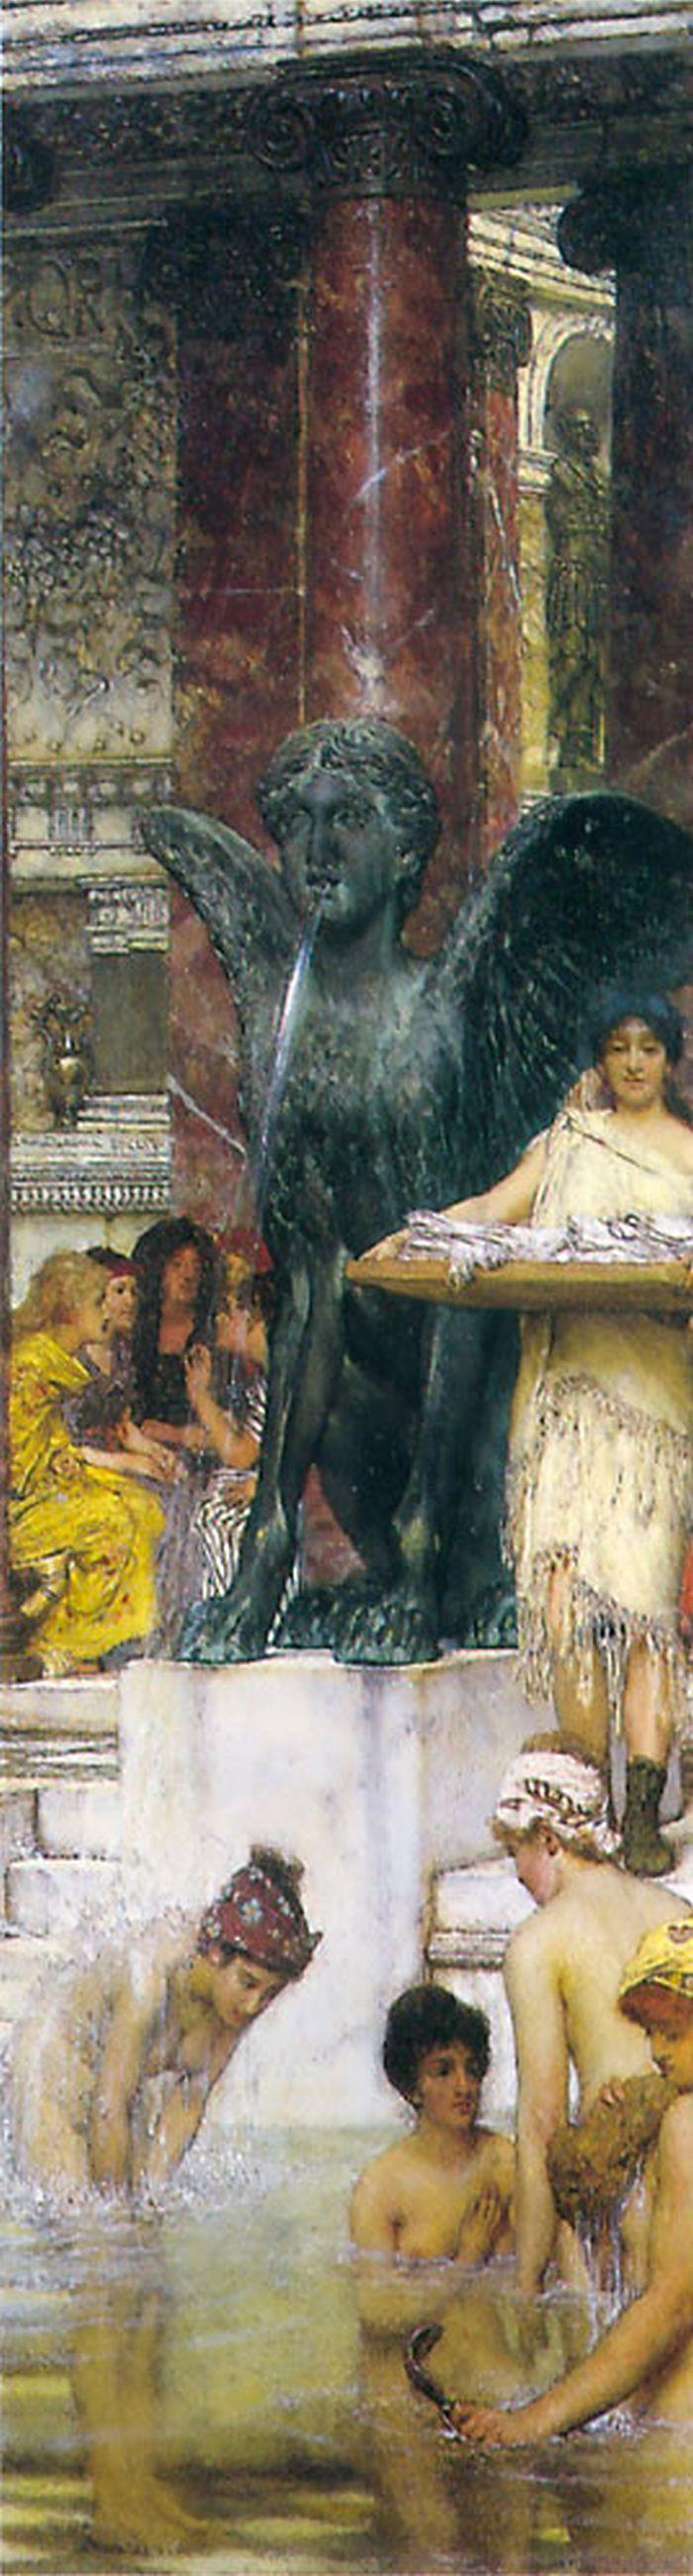 A Bath (An Antique Custom) by Sir Lawrence Alma-Tadema #art